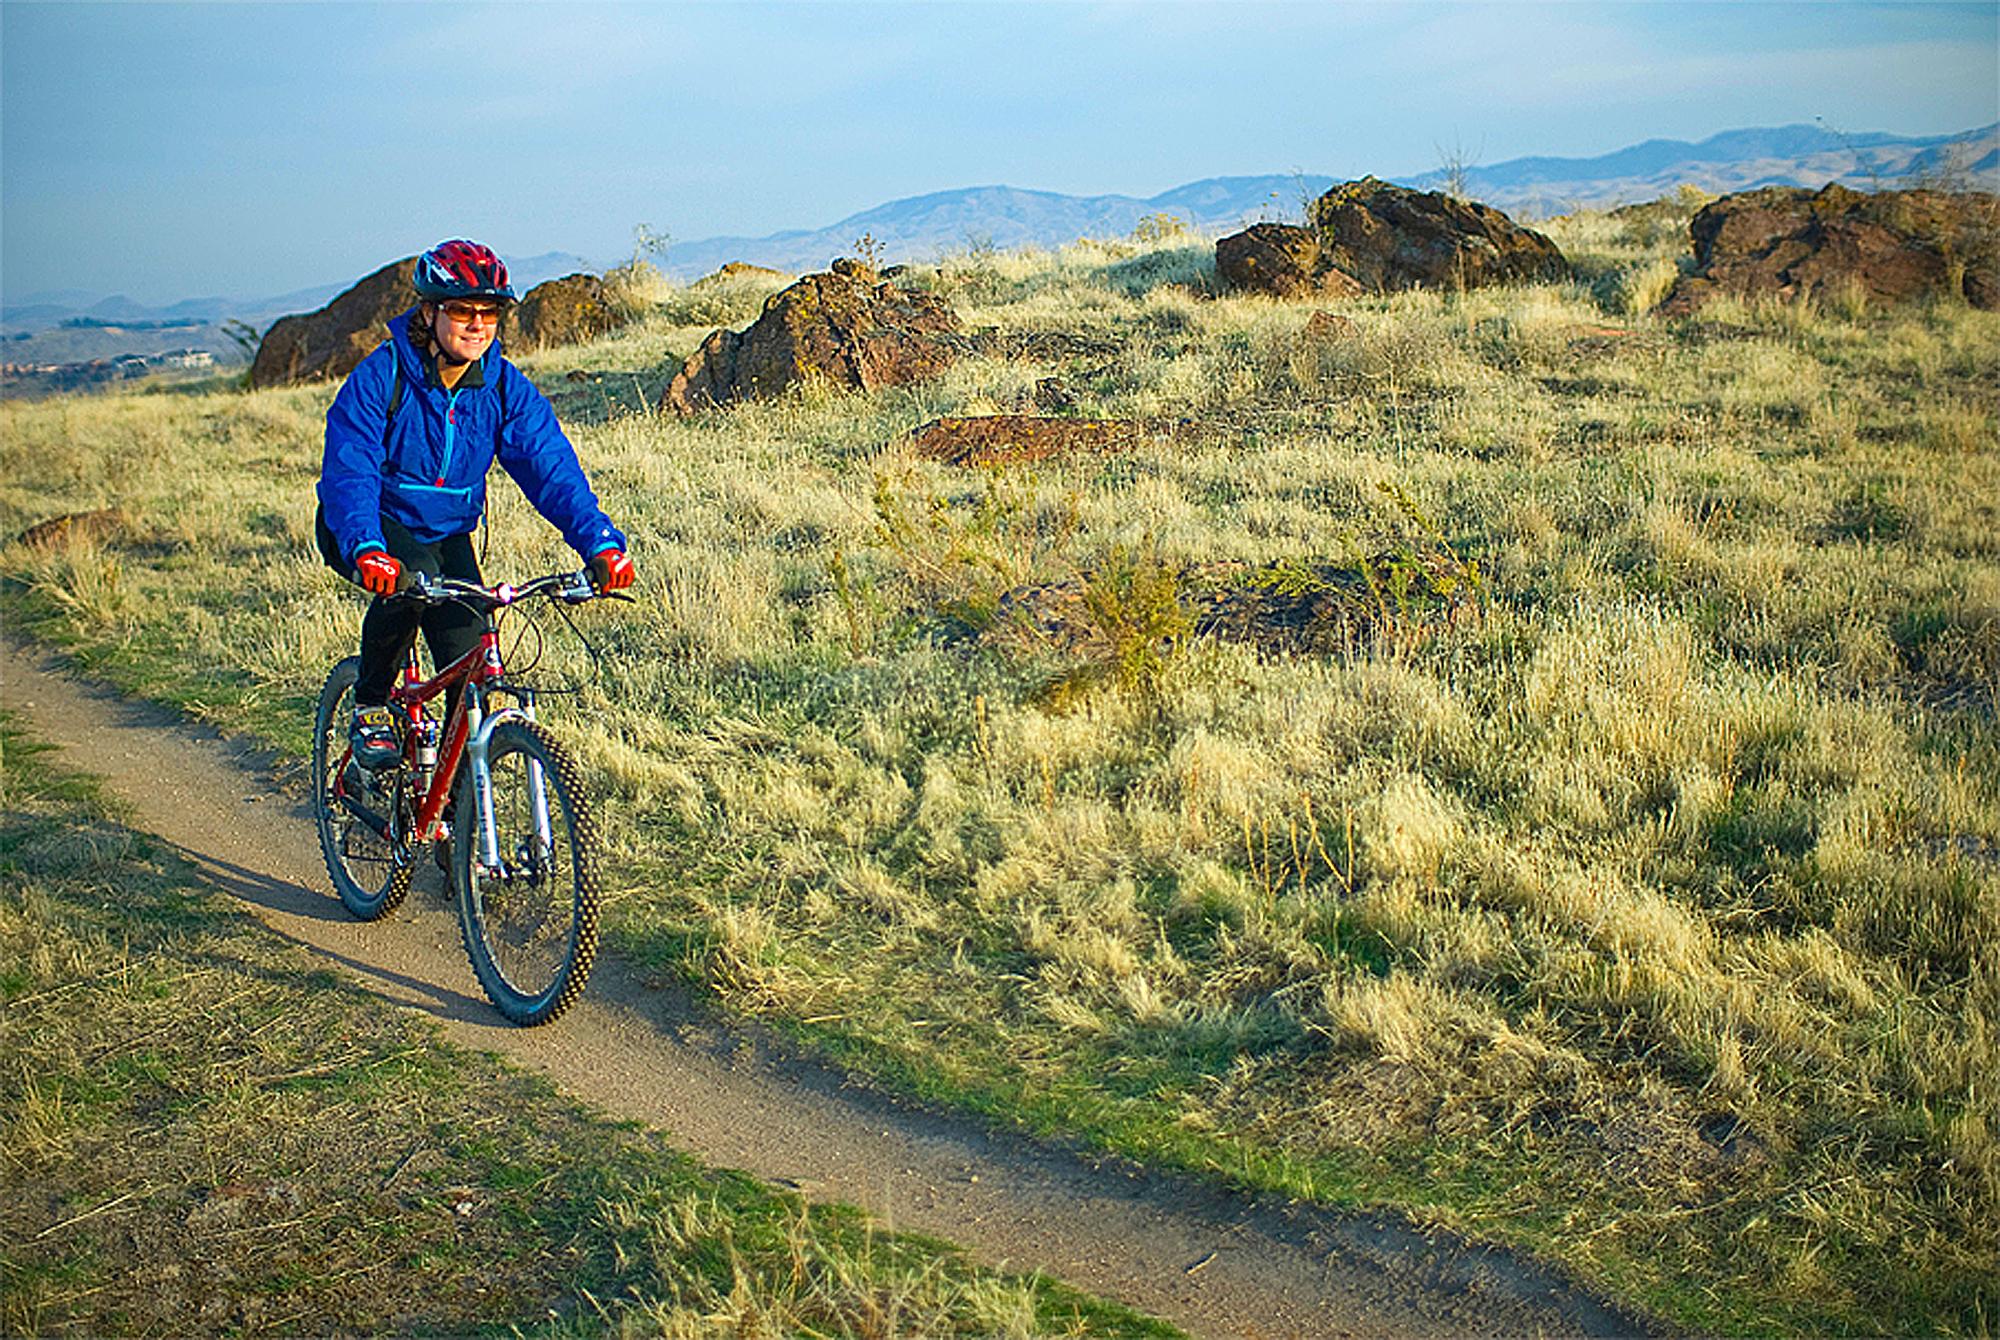 A mountain biker rides through the foothills above Boise, Idaho.